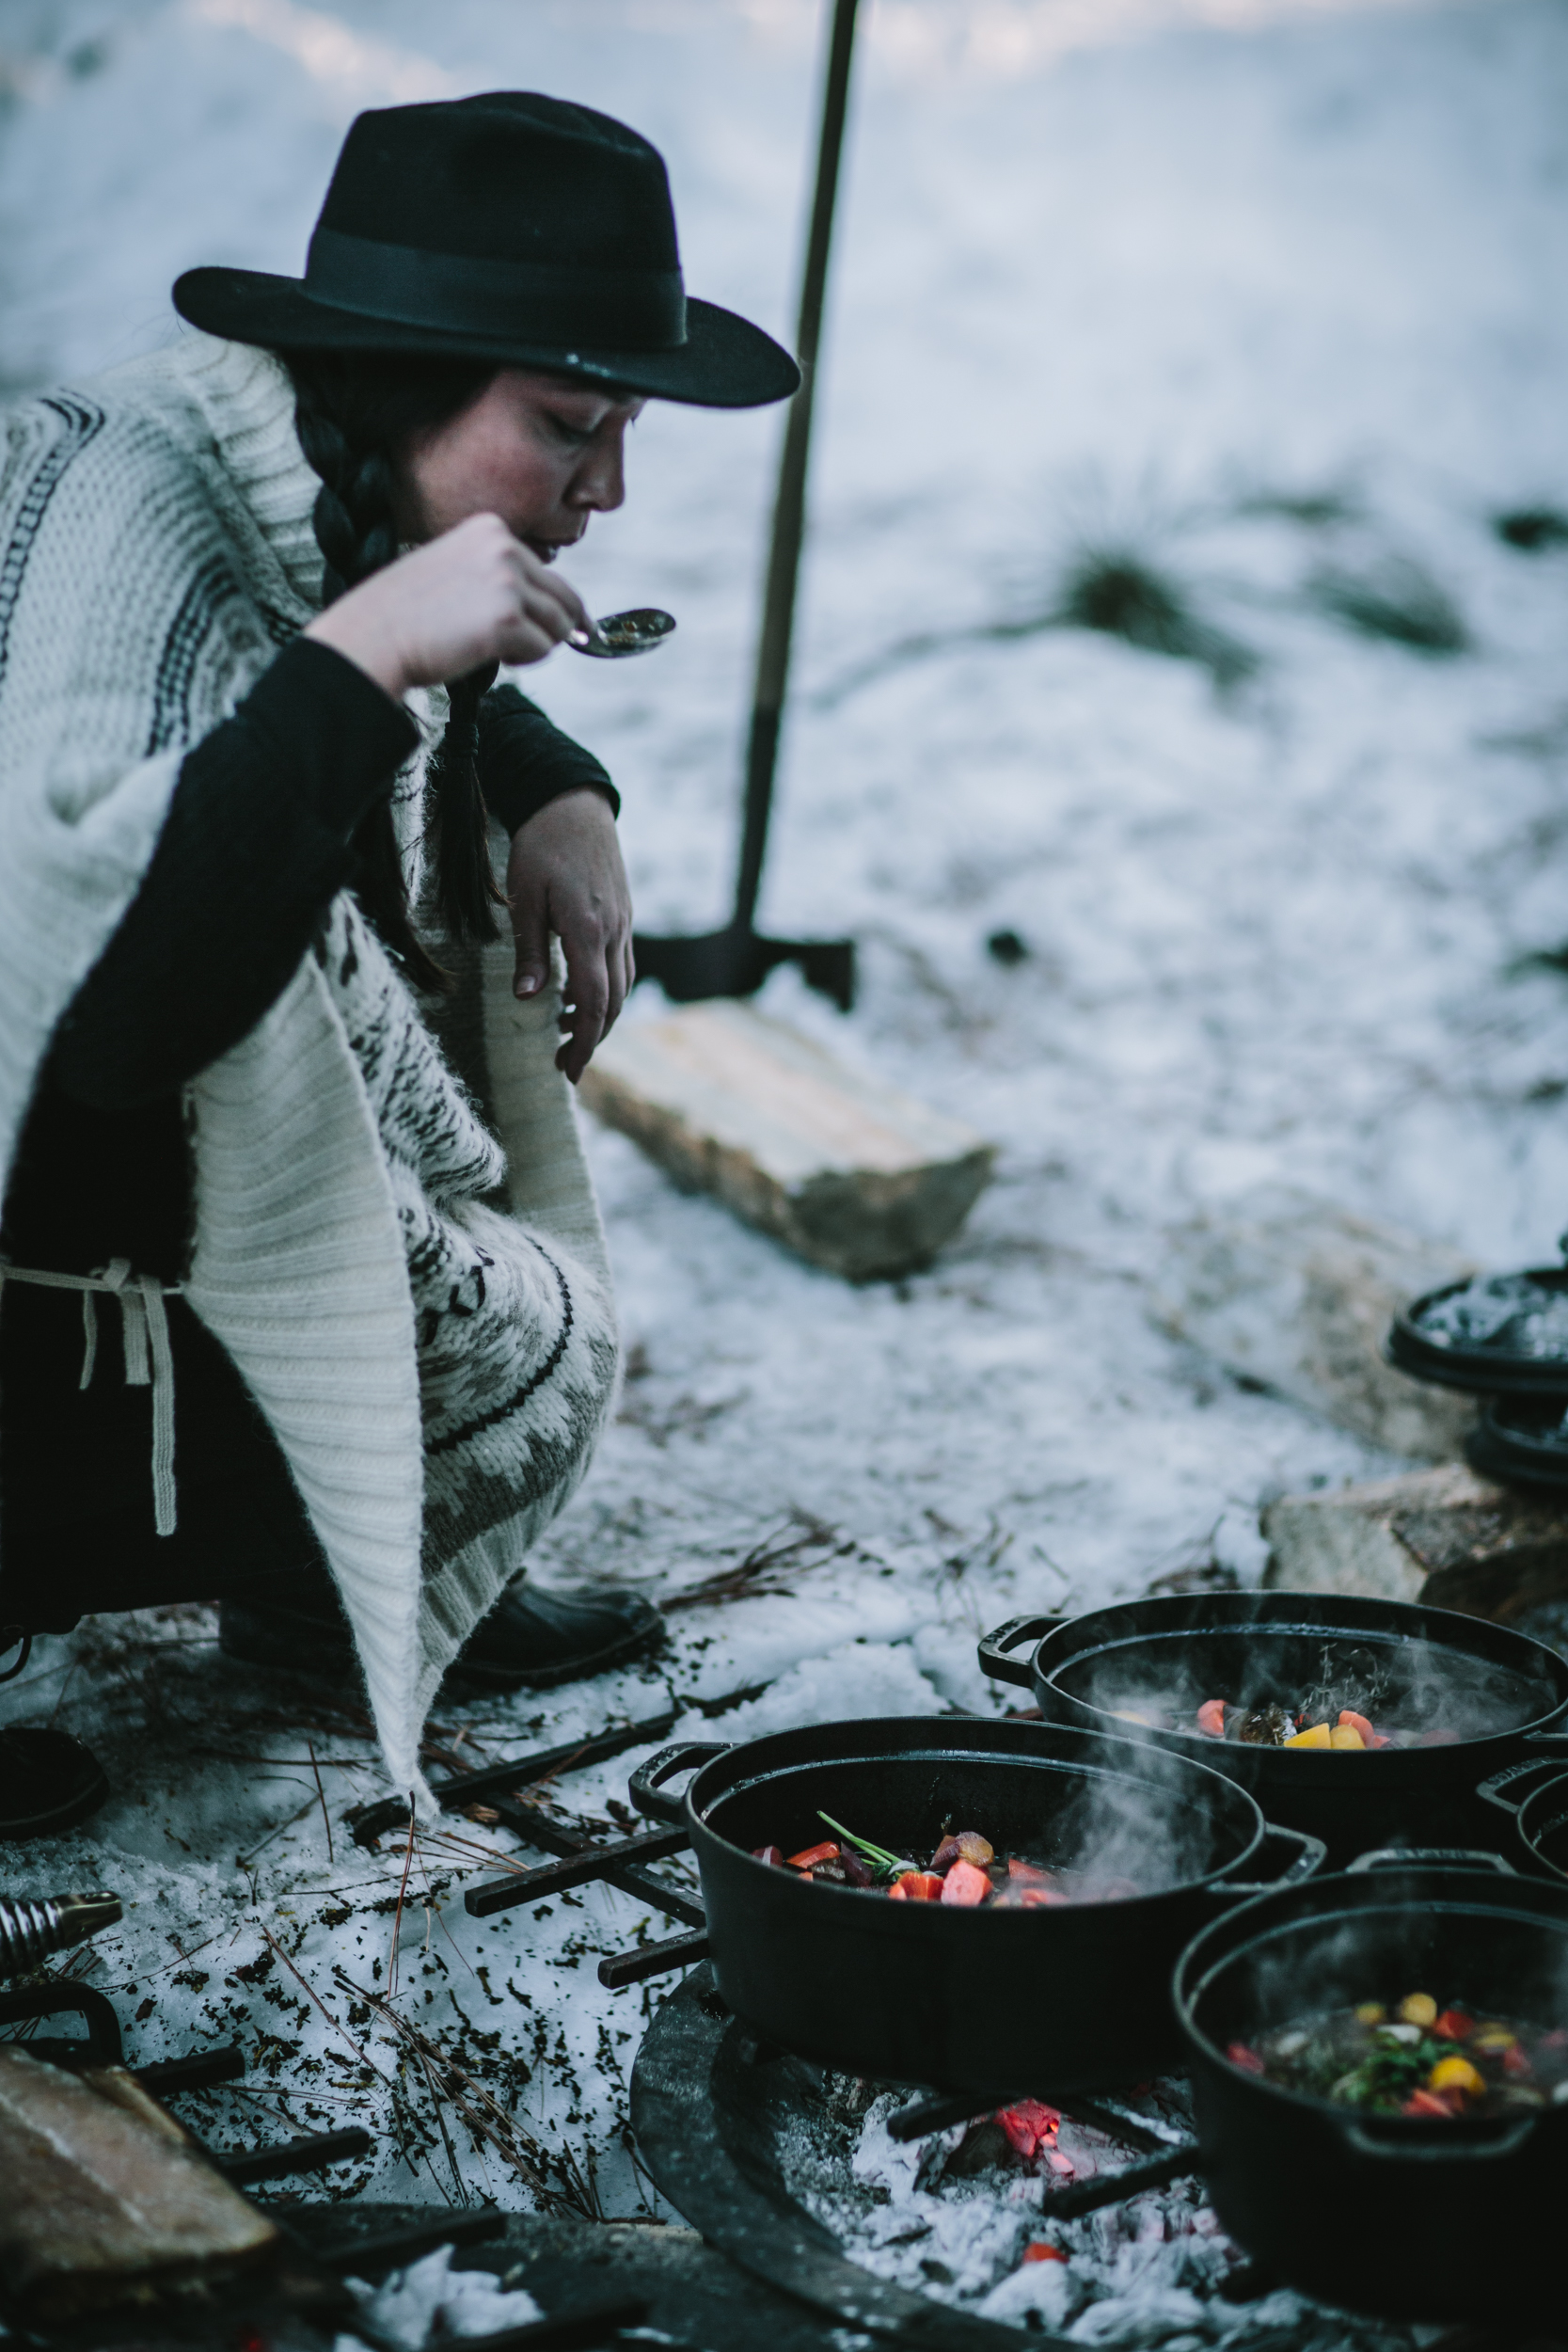 secret supper wintertide by eva kosmas flores.jpeg